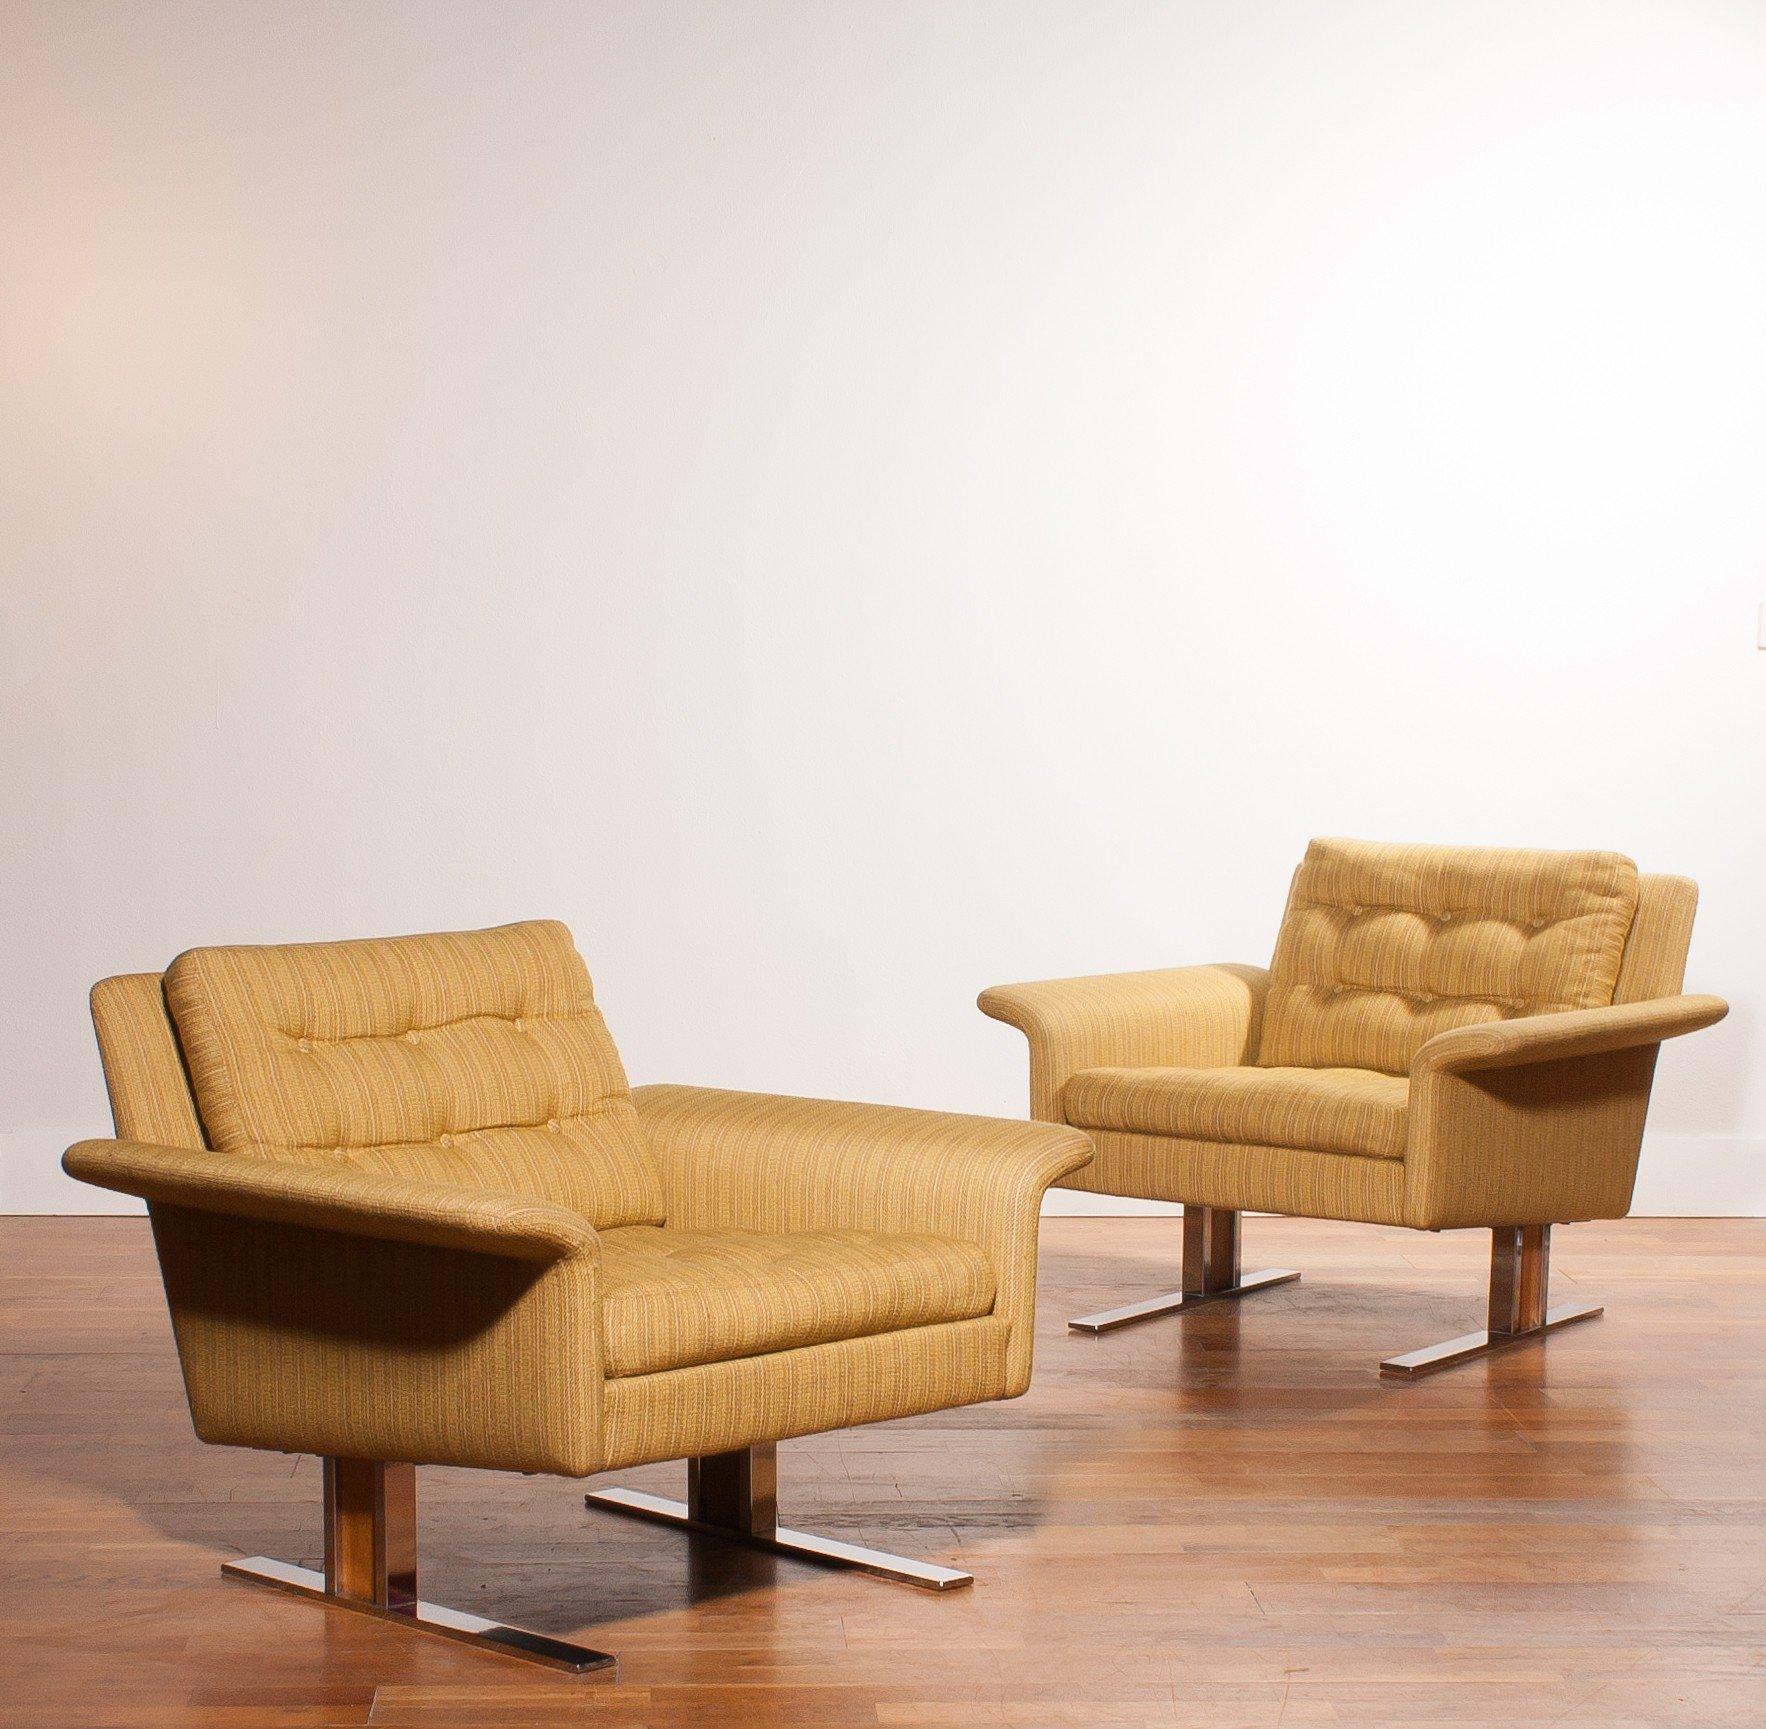 Pair of yellow Lounge Chairs, Johannes ANDERSEN - 1960s - Design Market